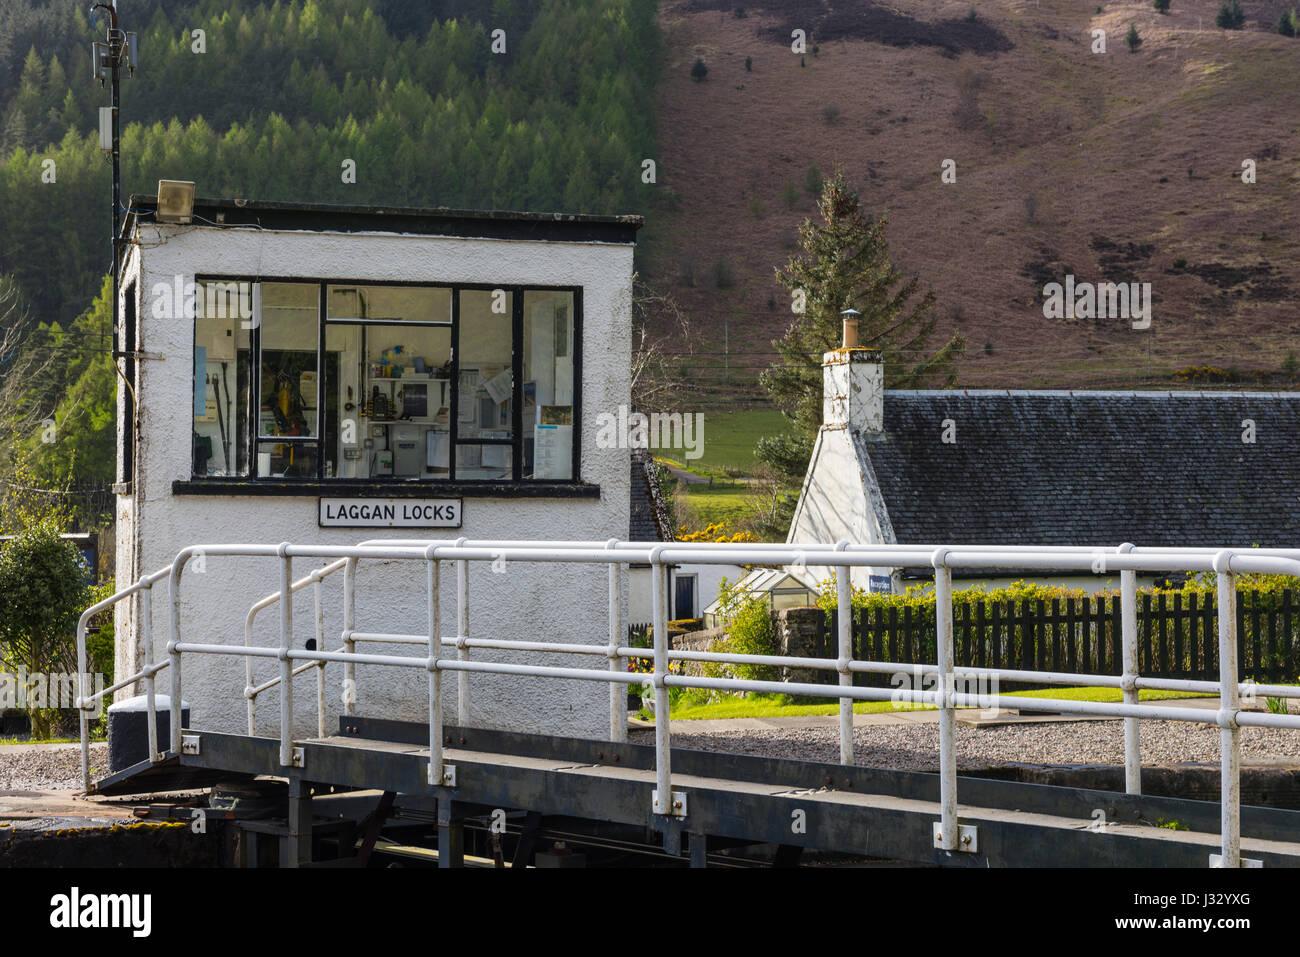 Laggan lock keeper's hut, Caledonian Canal, Highlands, Scotland, UK. - Stock Image